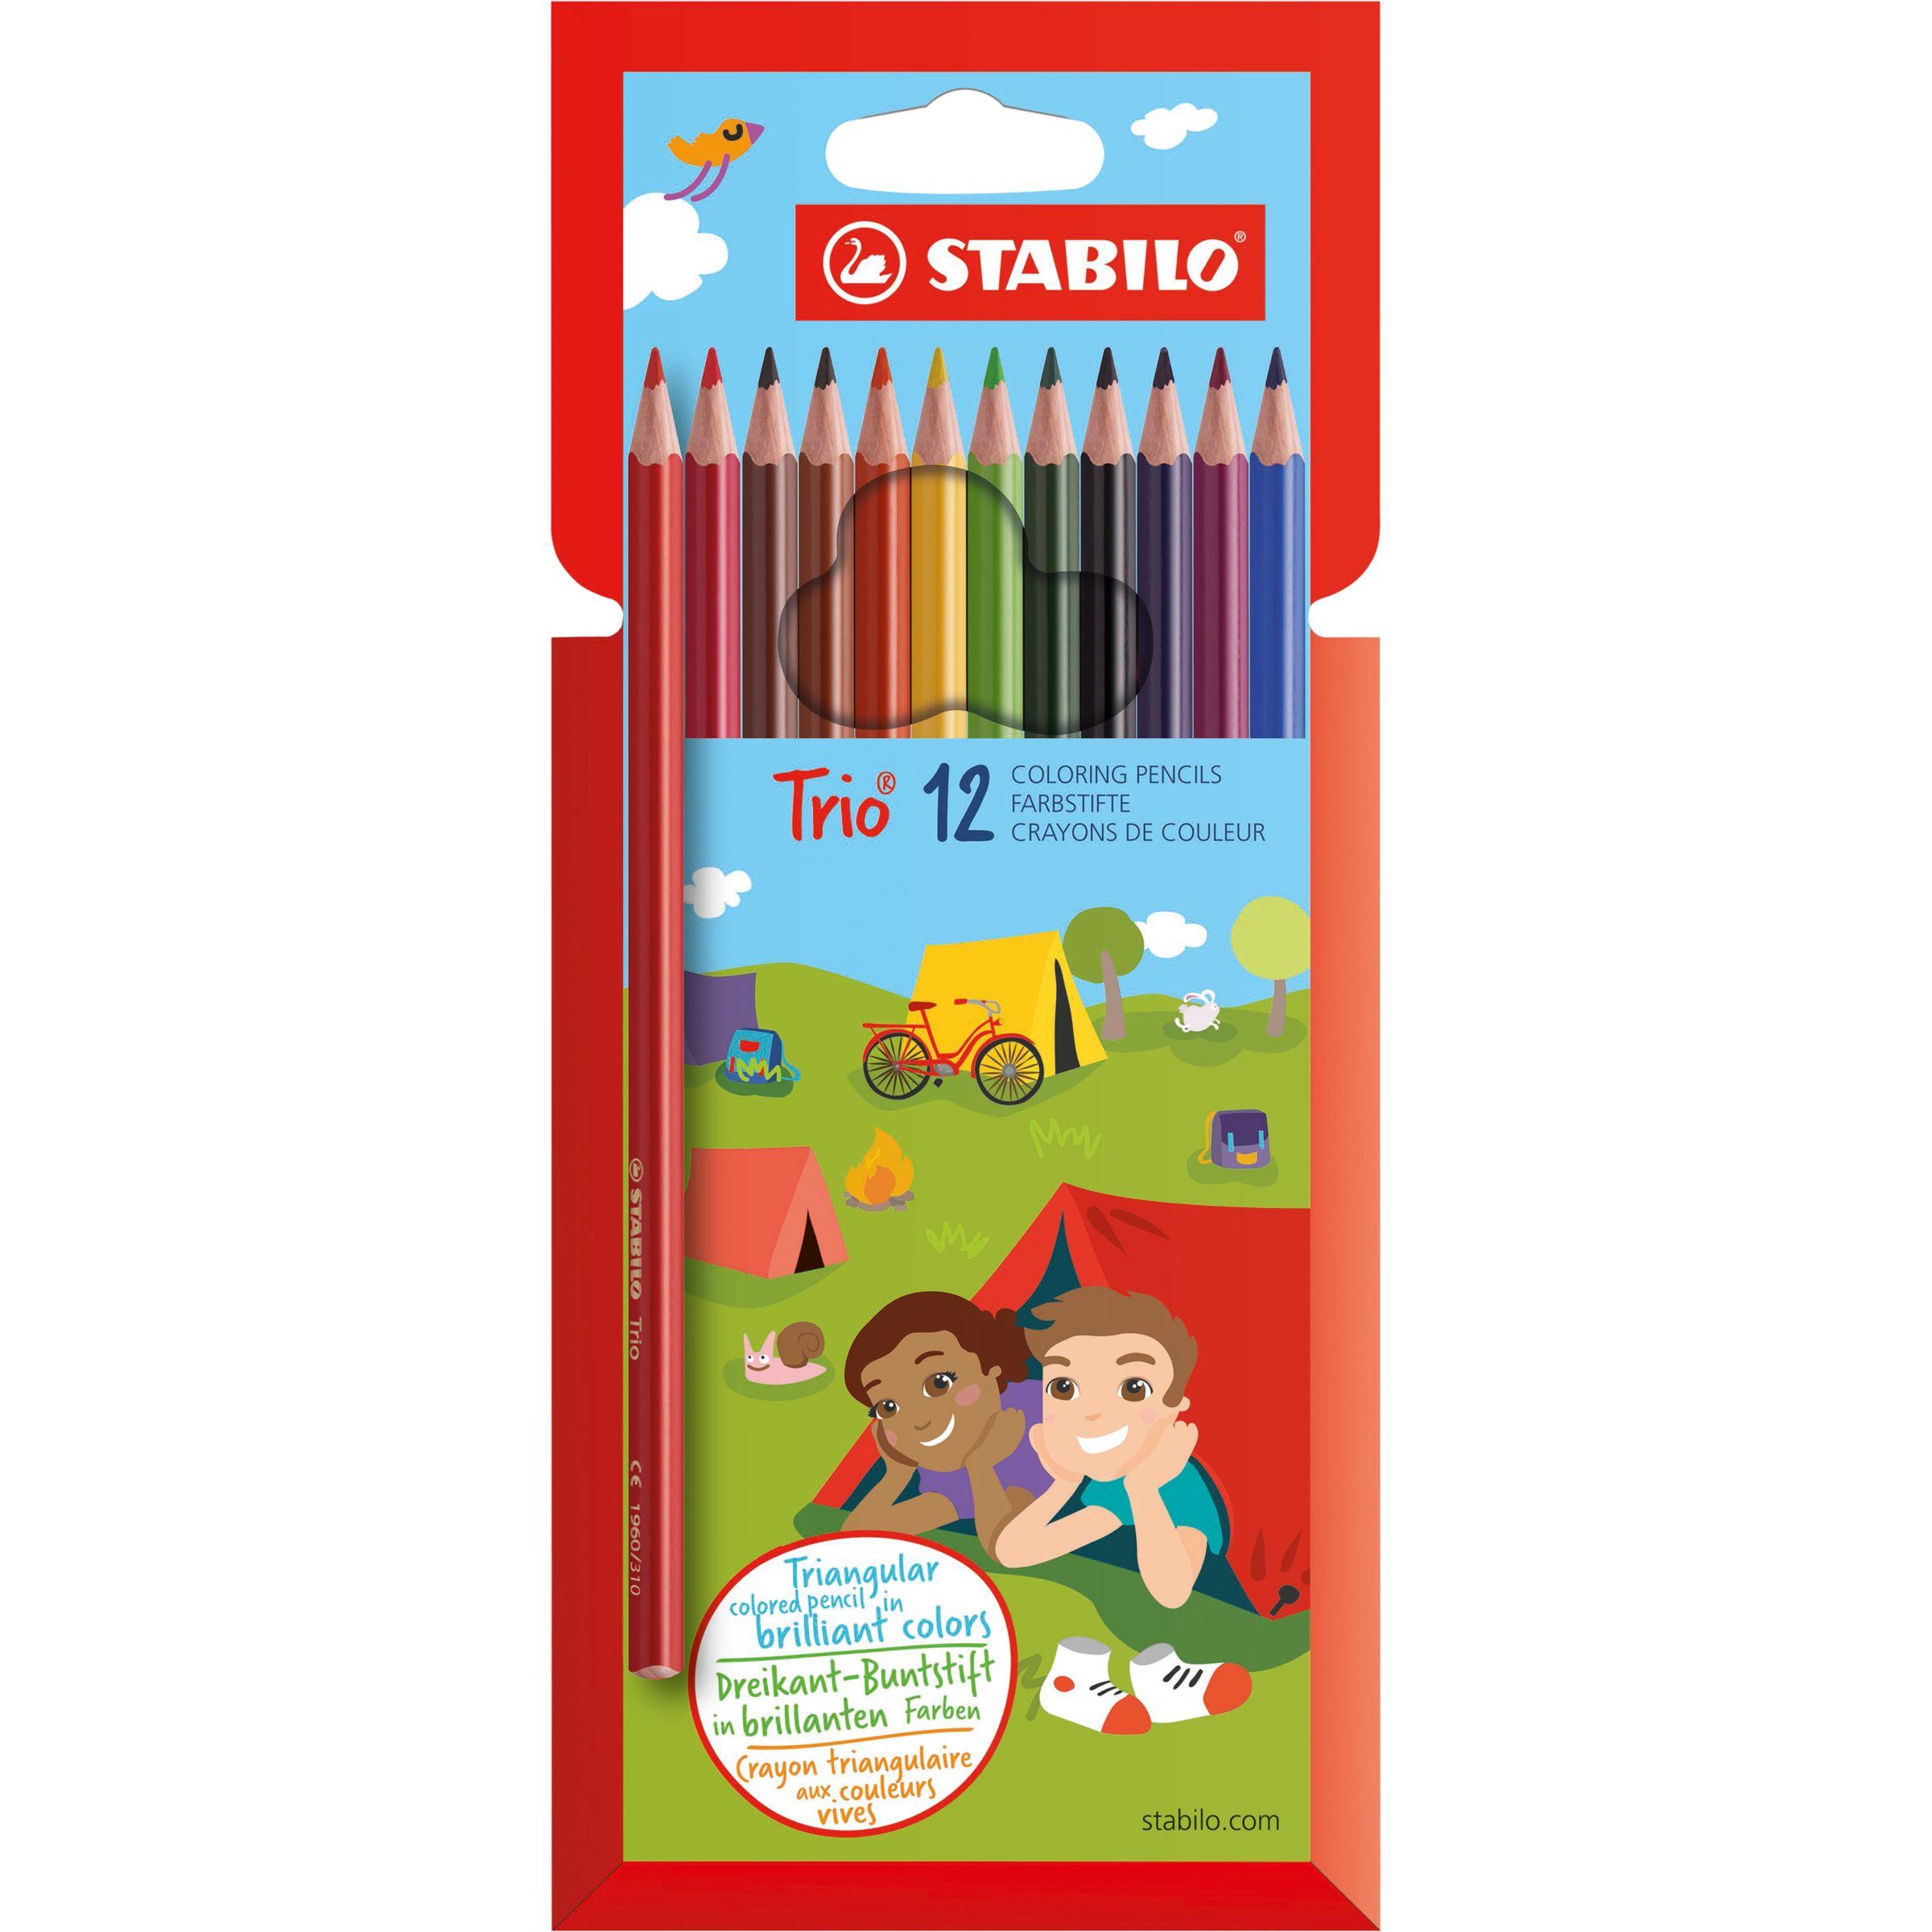 Stabilo Stabilo Trio Thick Coloured Pencils, Pack of 12